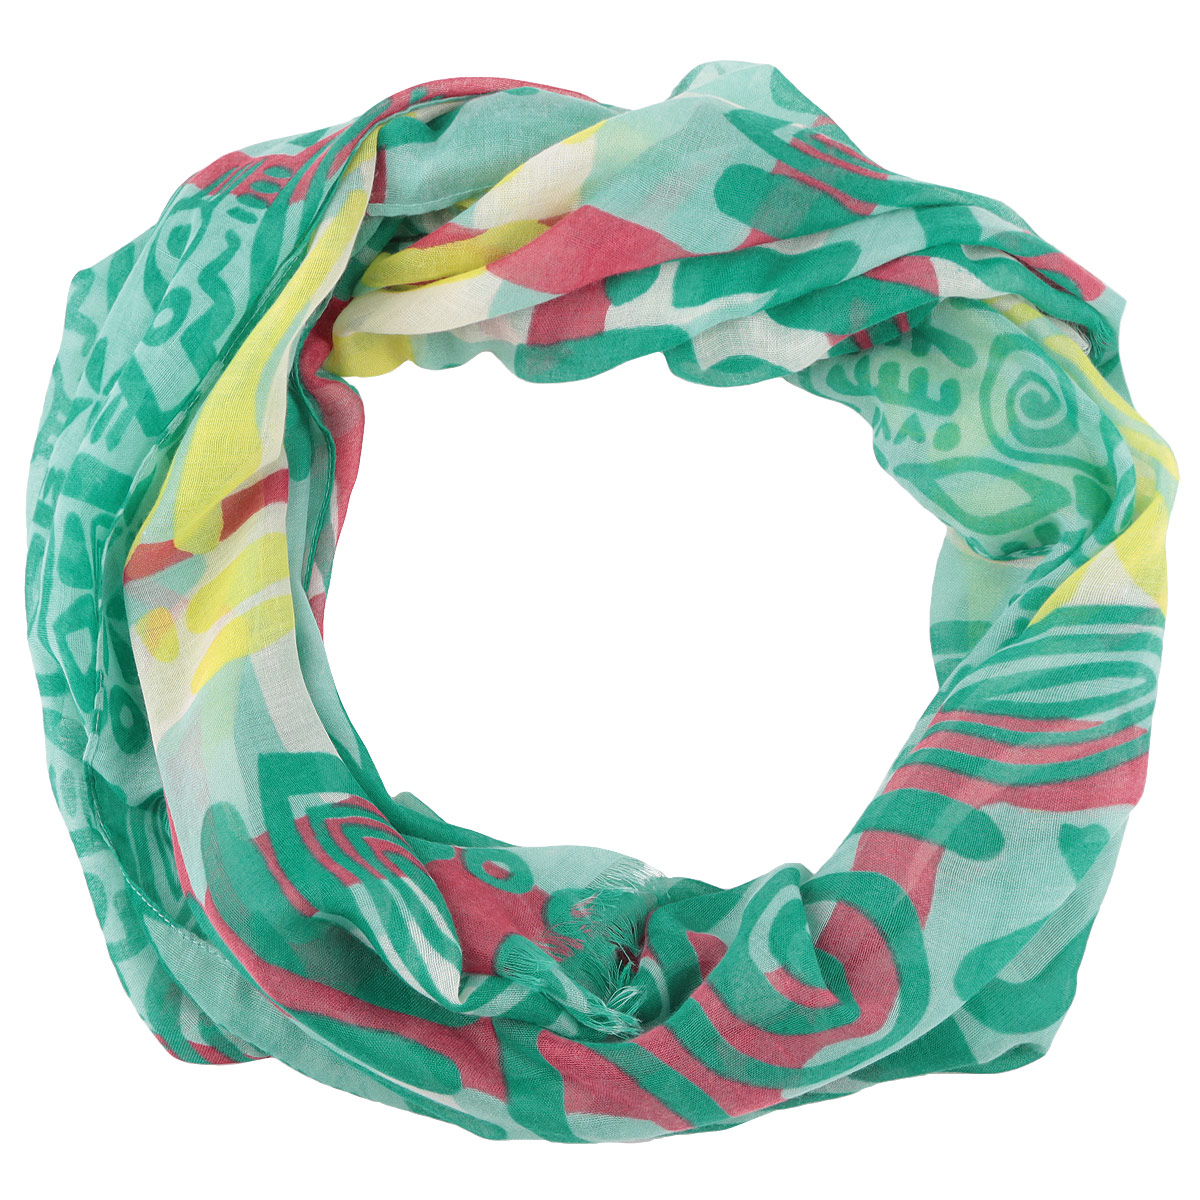 Палантин Passigatti, цвет: зеленый. 3402941-15. Размер 70 см х 200 см